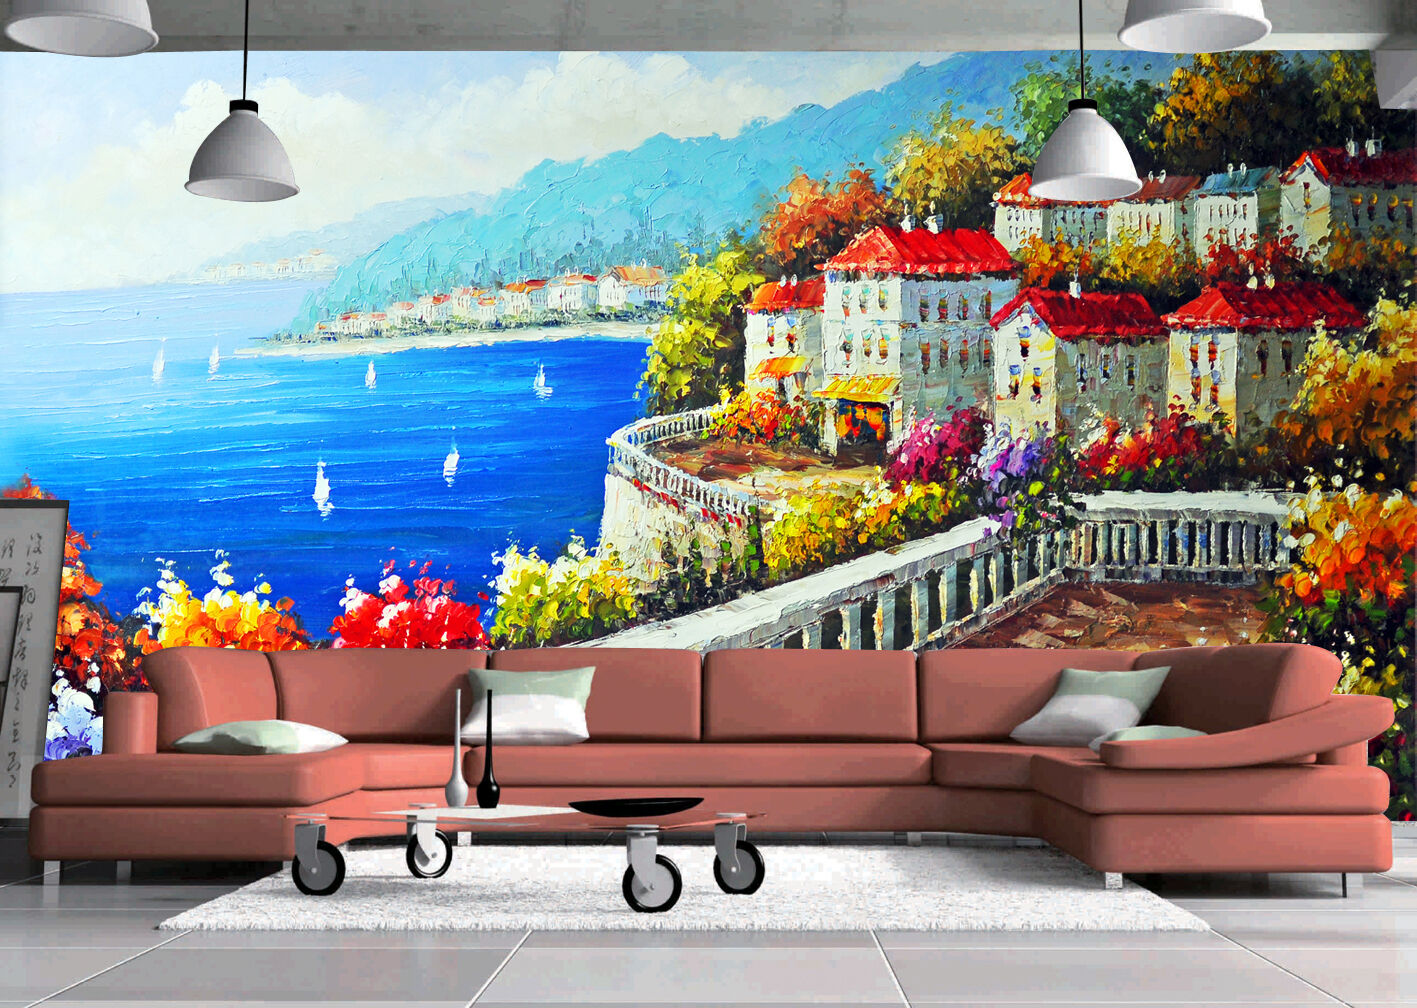 3D Seaside painting 1 WallPaper Murals Wall Print Decal Wall Deco AJ WALLPAPER